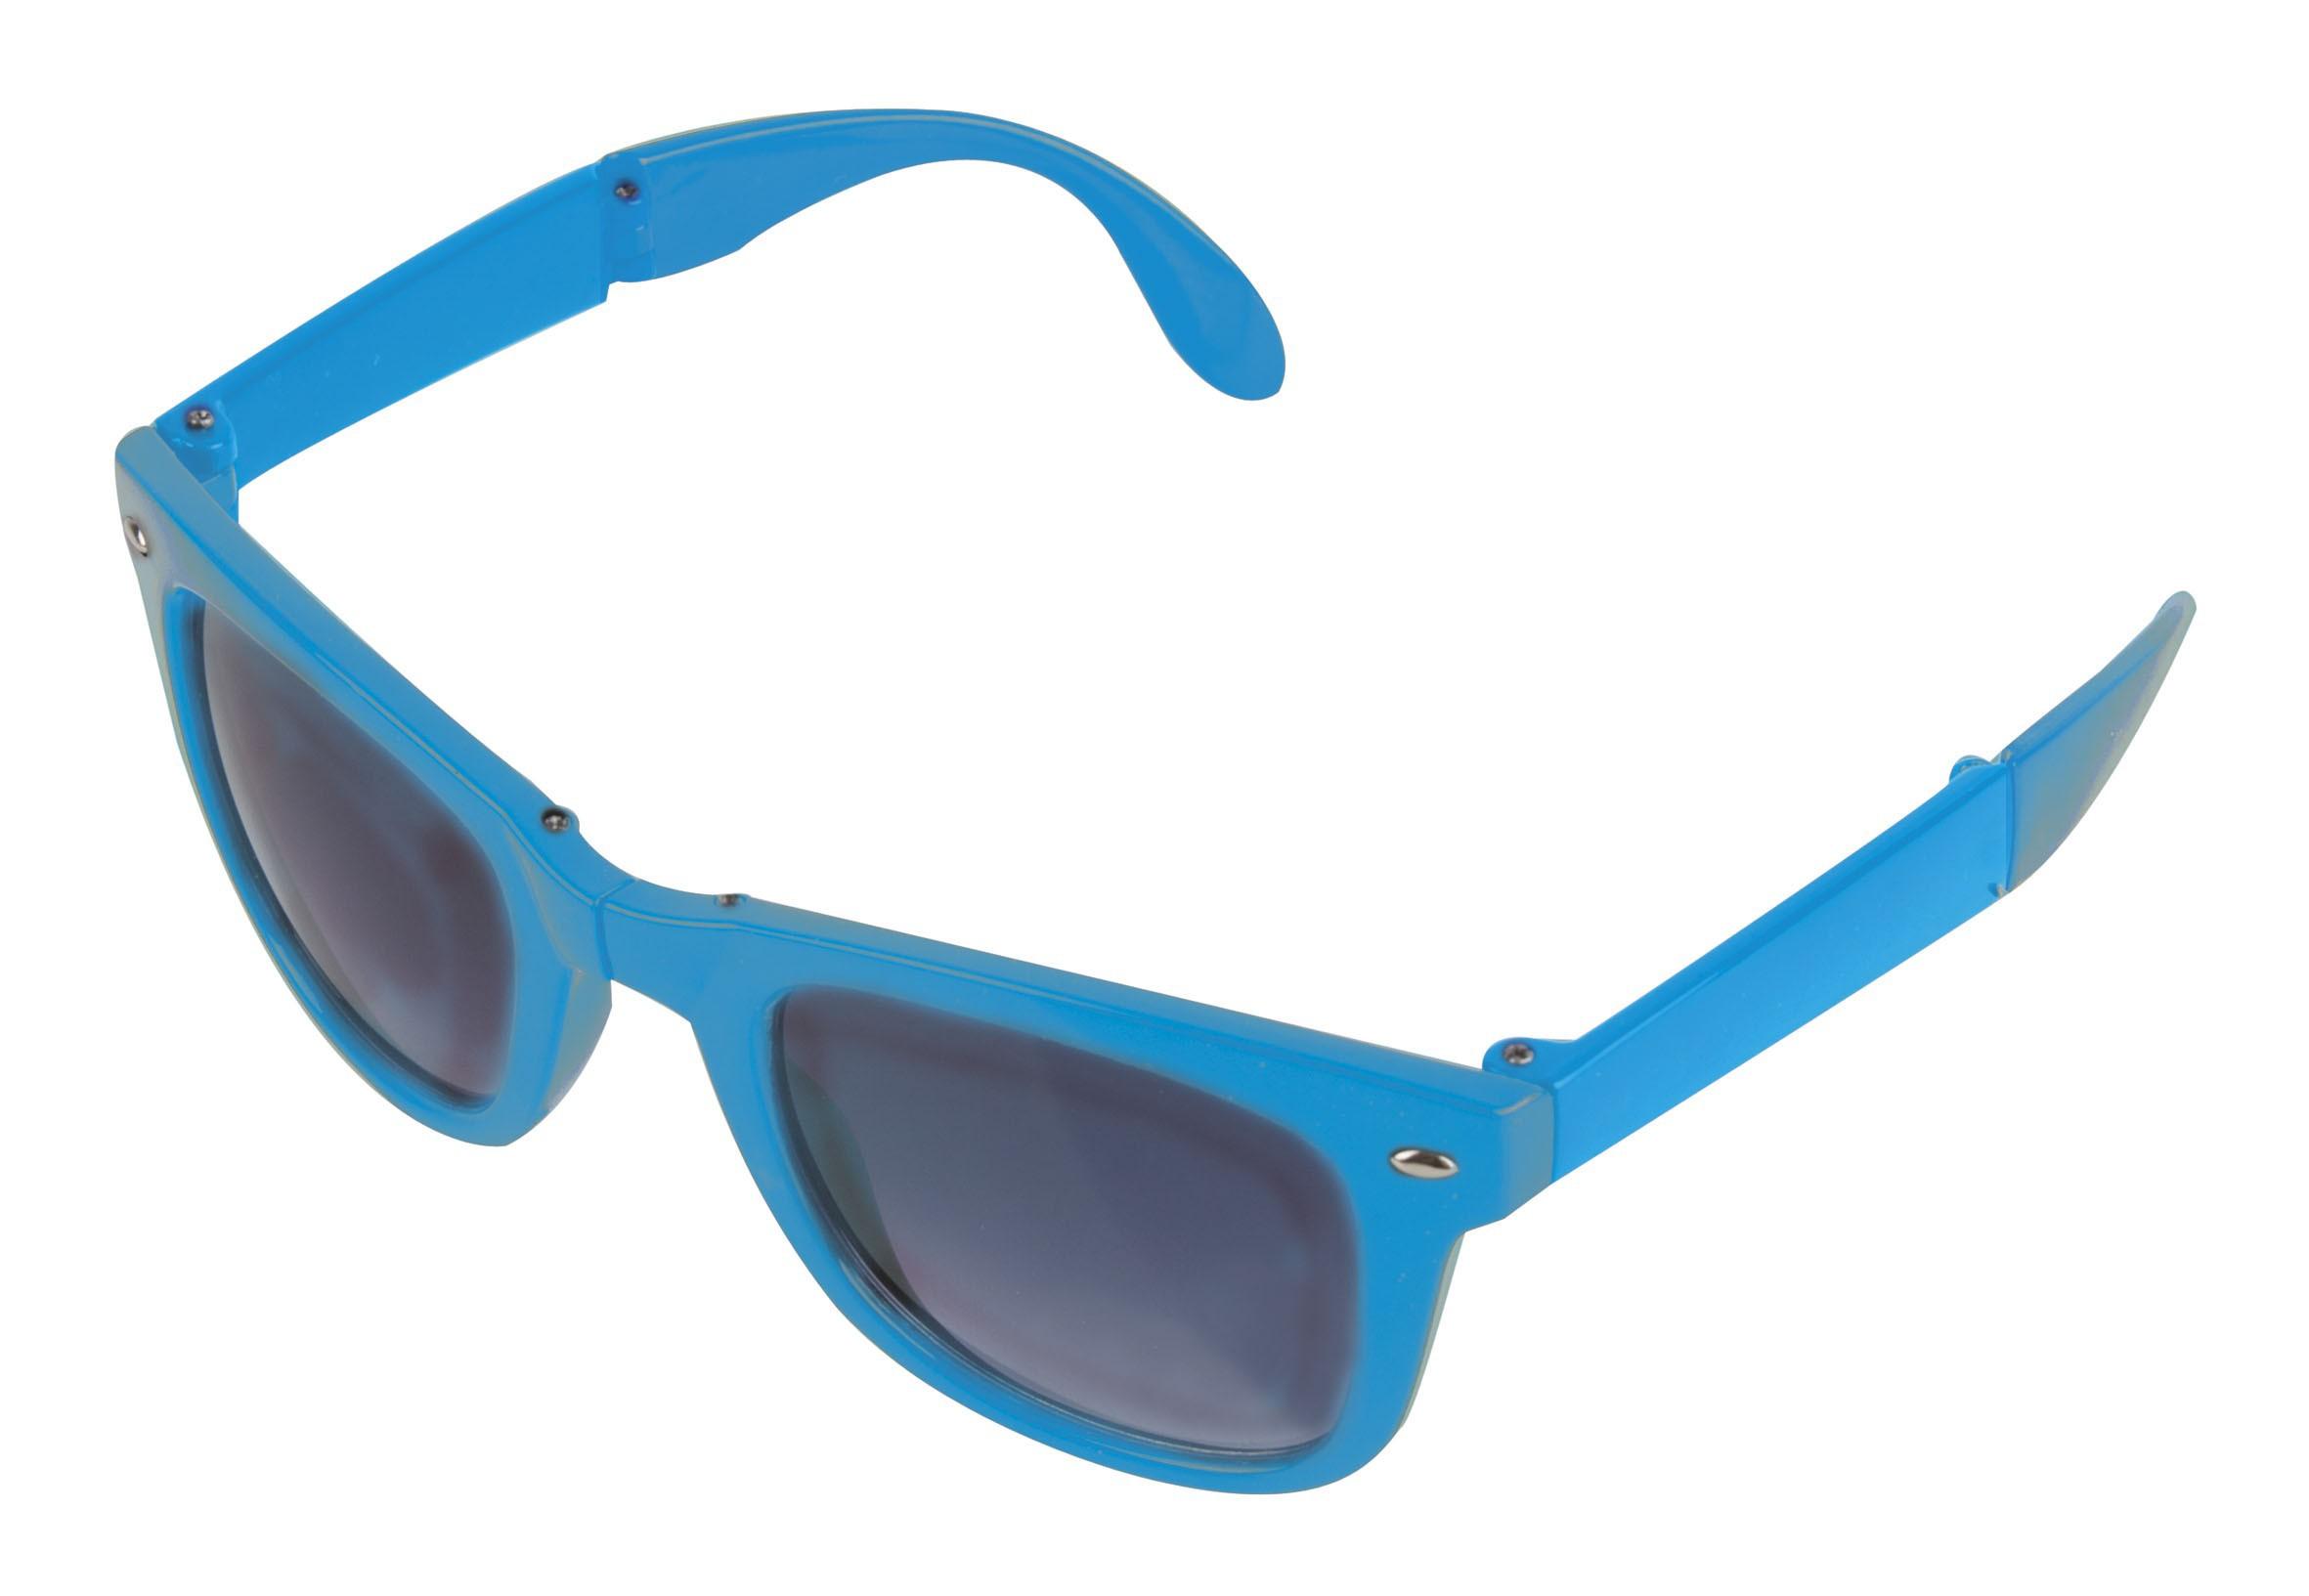 Gafas de Sol Plegables Publicitarias - Regalos Empresa Personalizados b0116a3d433